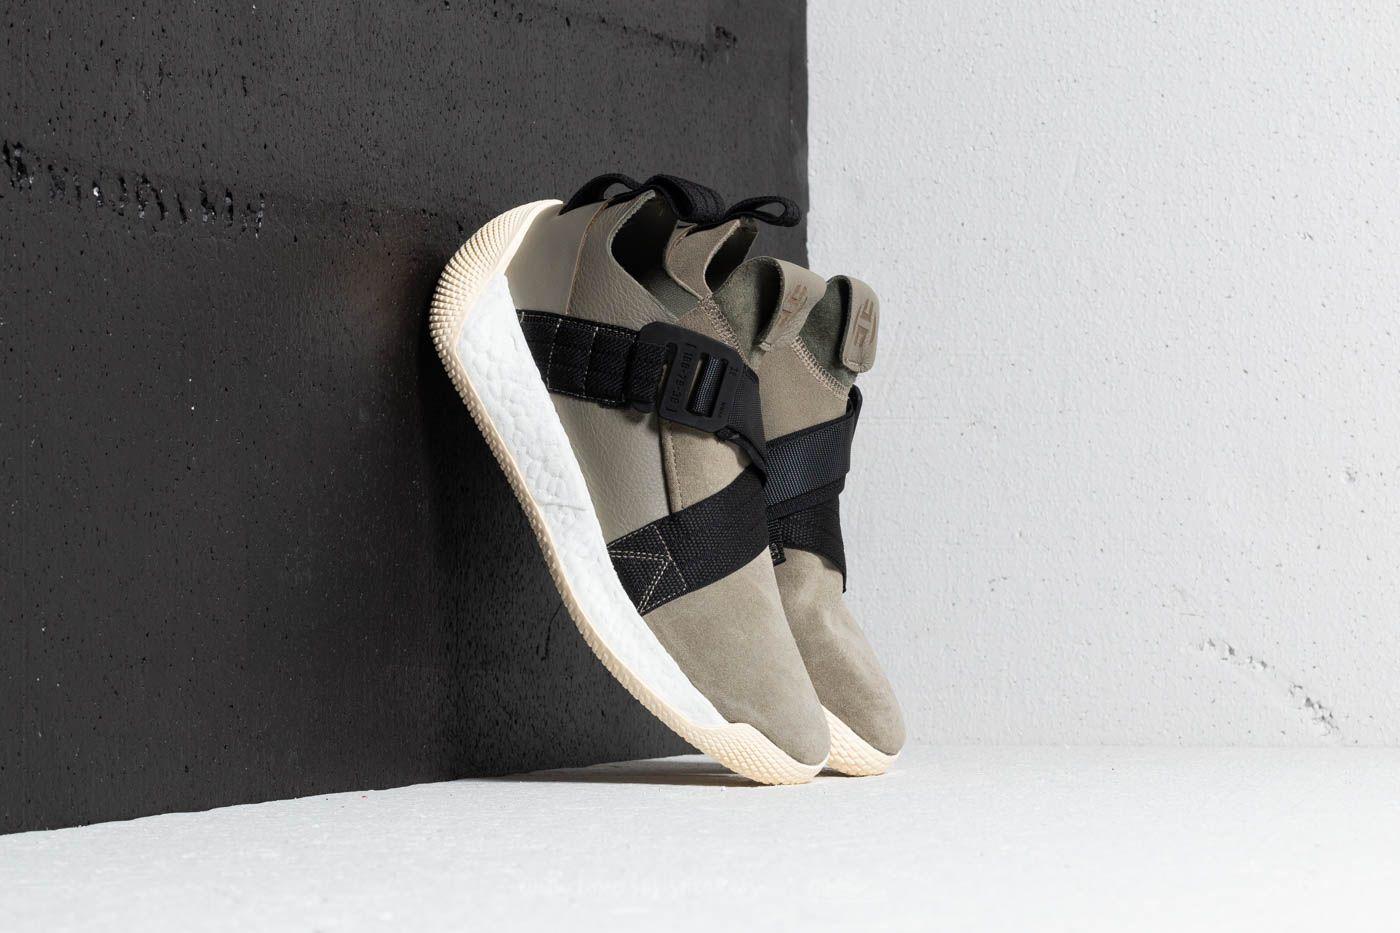 Adidas Harden Vol. 2 LS Buckle